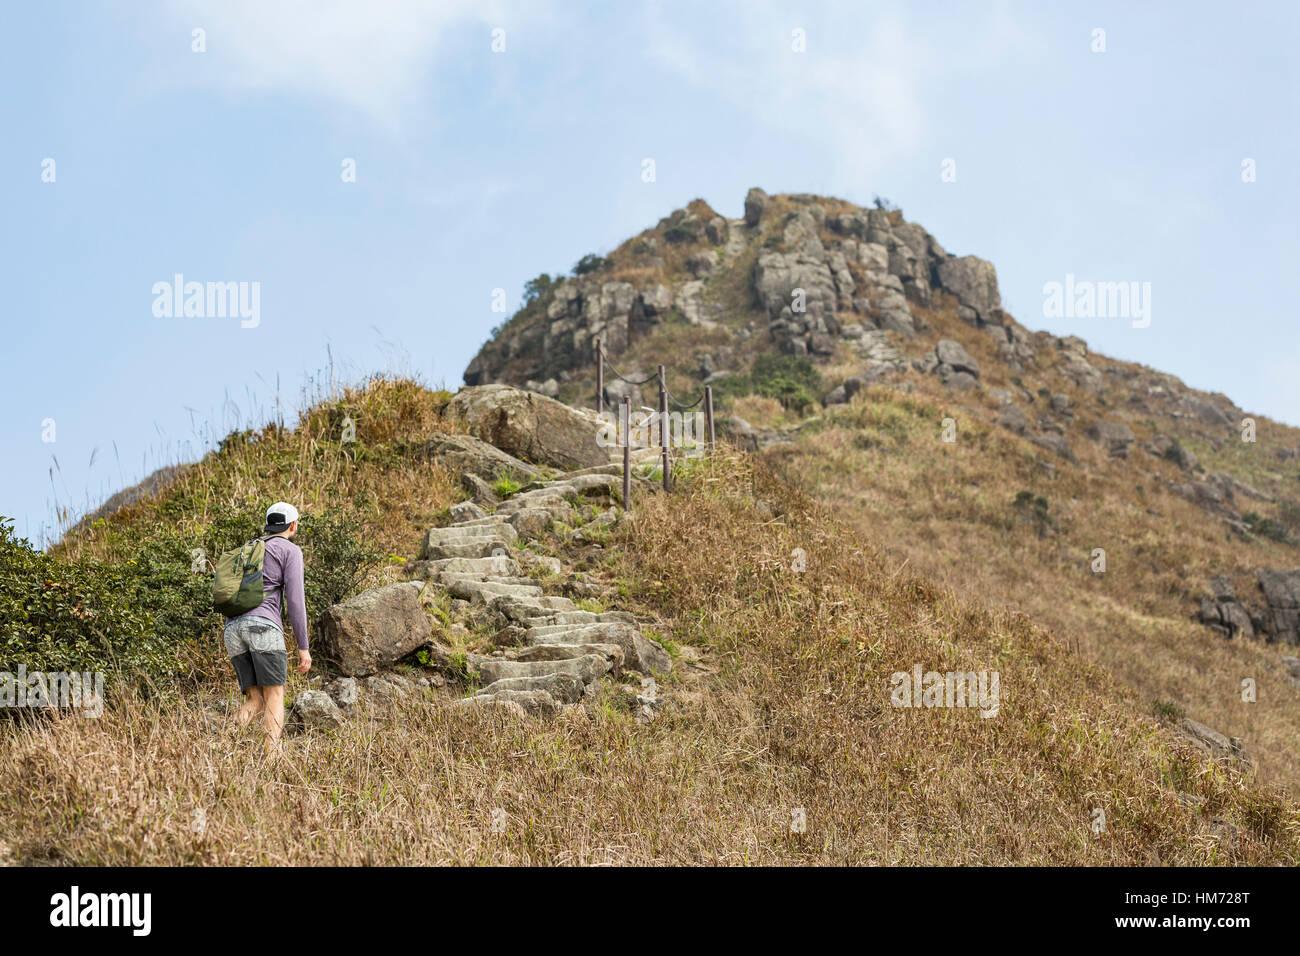 Hiking up Lantau Peak and Sunset Peak, on Lantau Island, Hong Kong, January 26 2017. - Stock Image